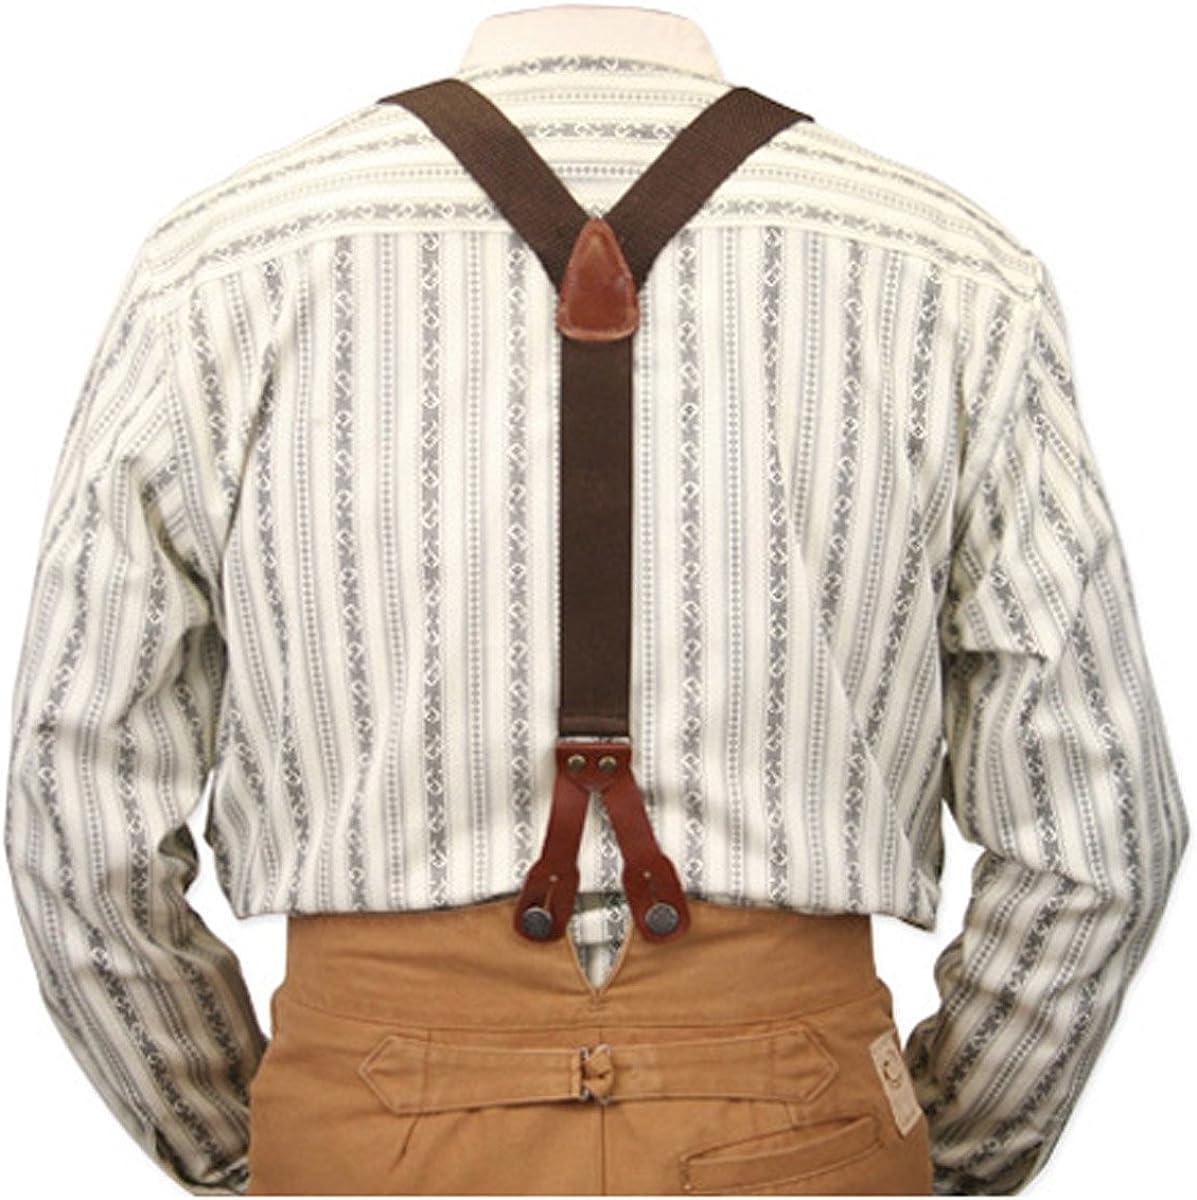 Historical Emporium Men's Canvas Stagecoach Y-Back Button End Suspenders